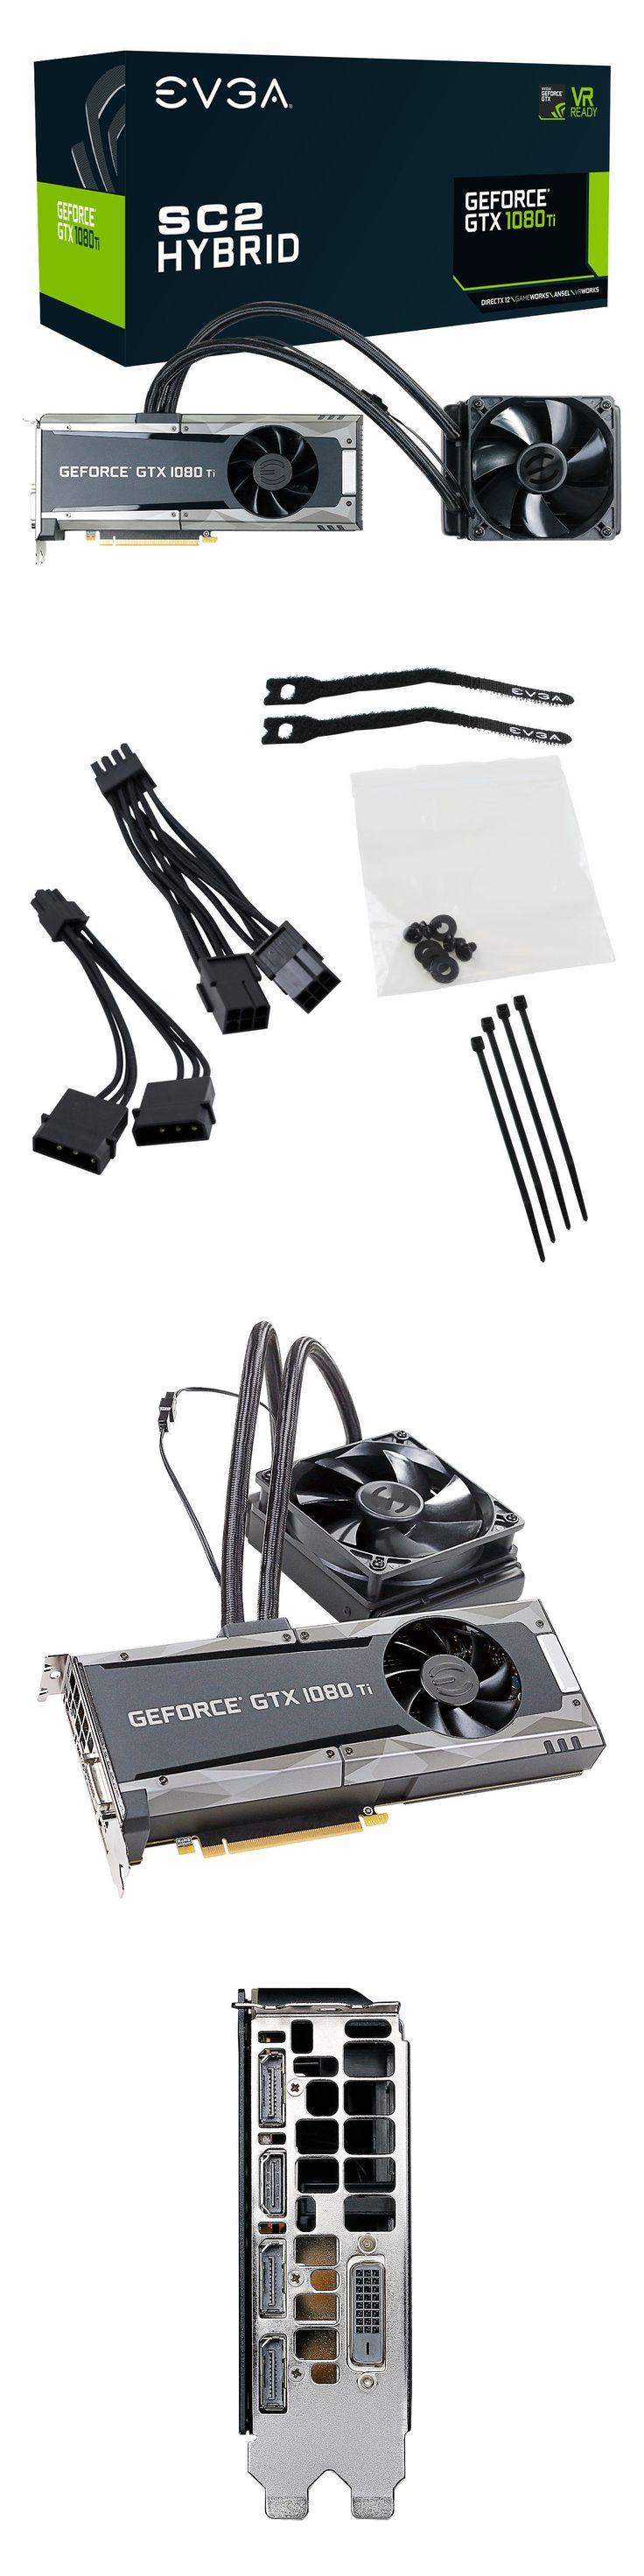 computer parts: Evga Geforce Gtx 1080 Ti Hybrid Gaming Video Card, 11G-P4-6598-Kr, 8Gb Gddr5x -> BUY IT NOW ONLY: $1109.99 on eBay!